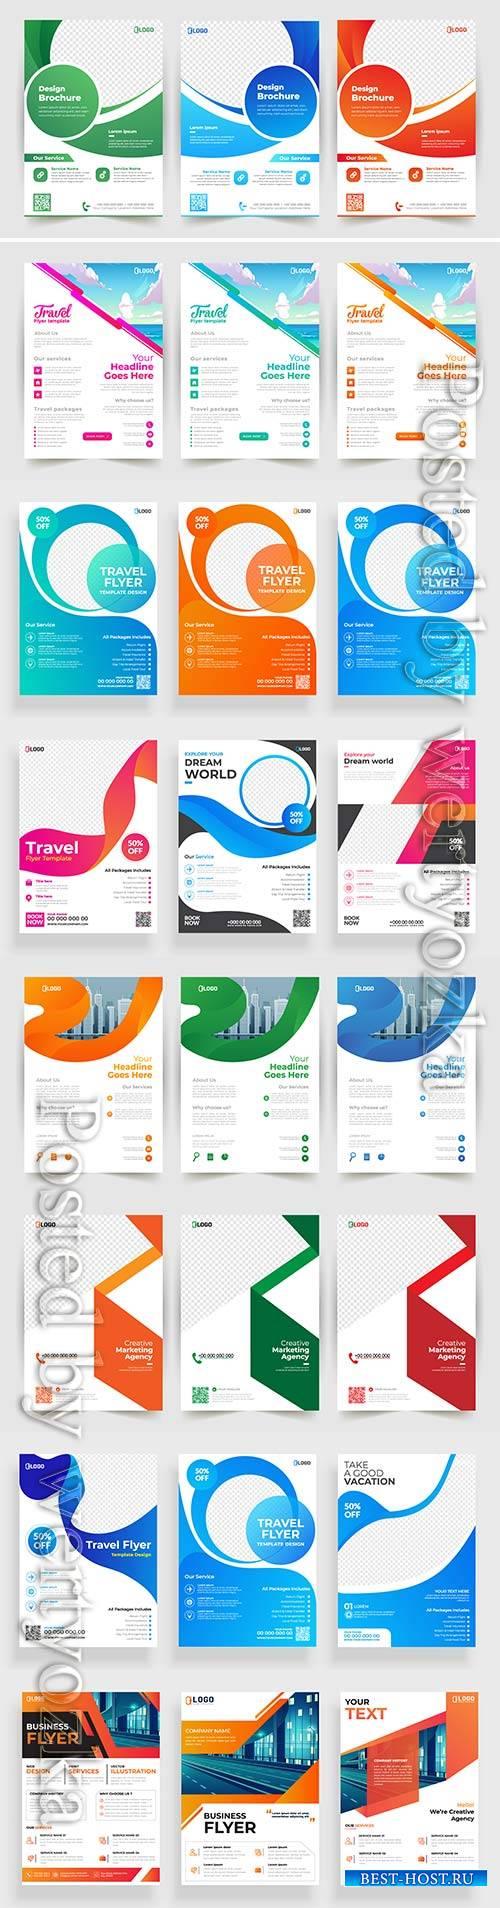 Business vector flyer template design